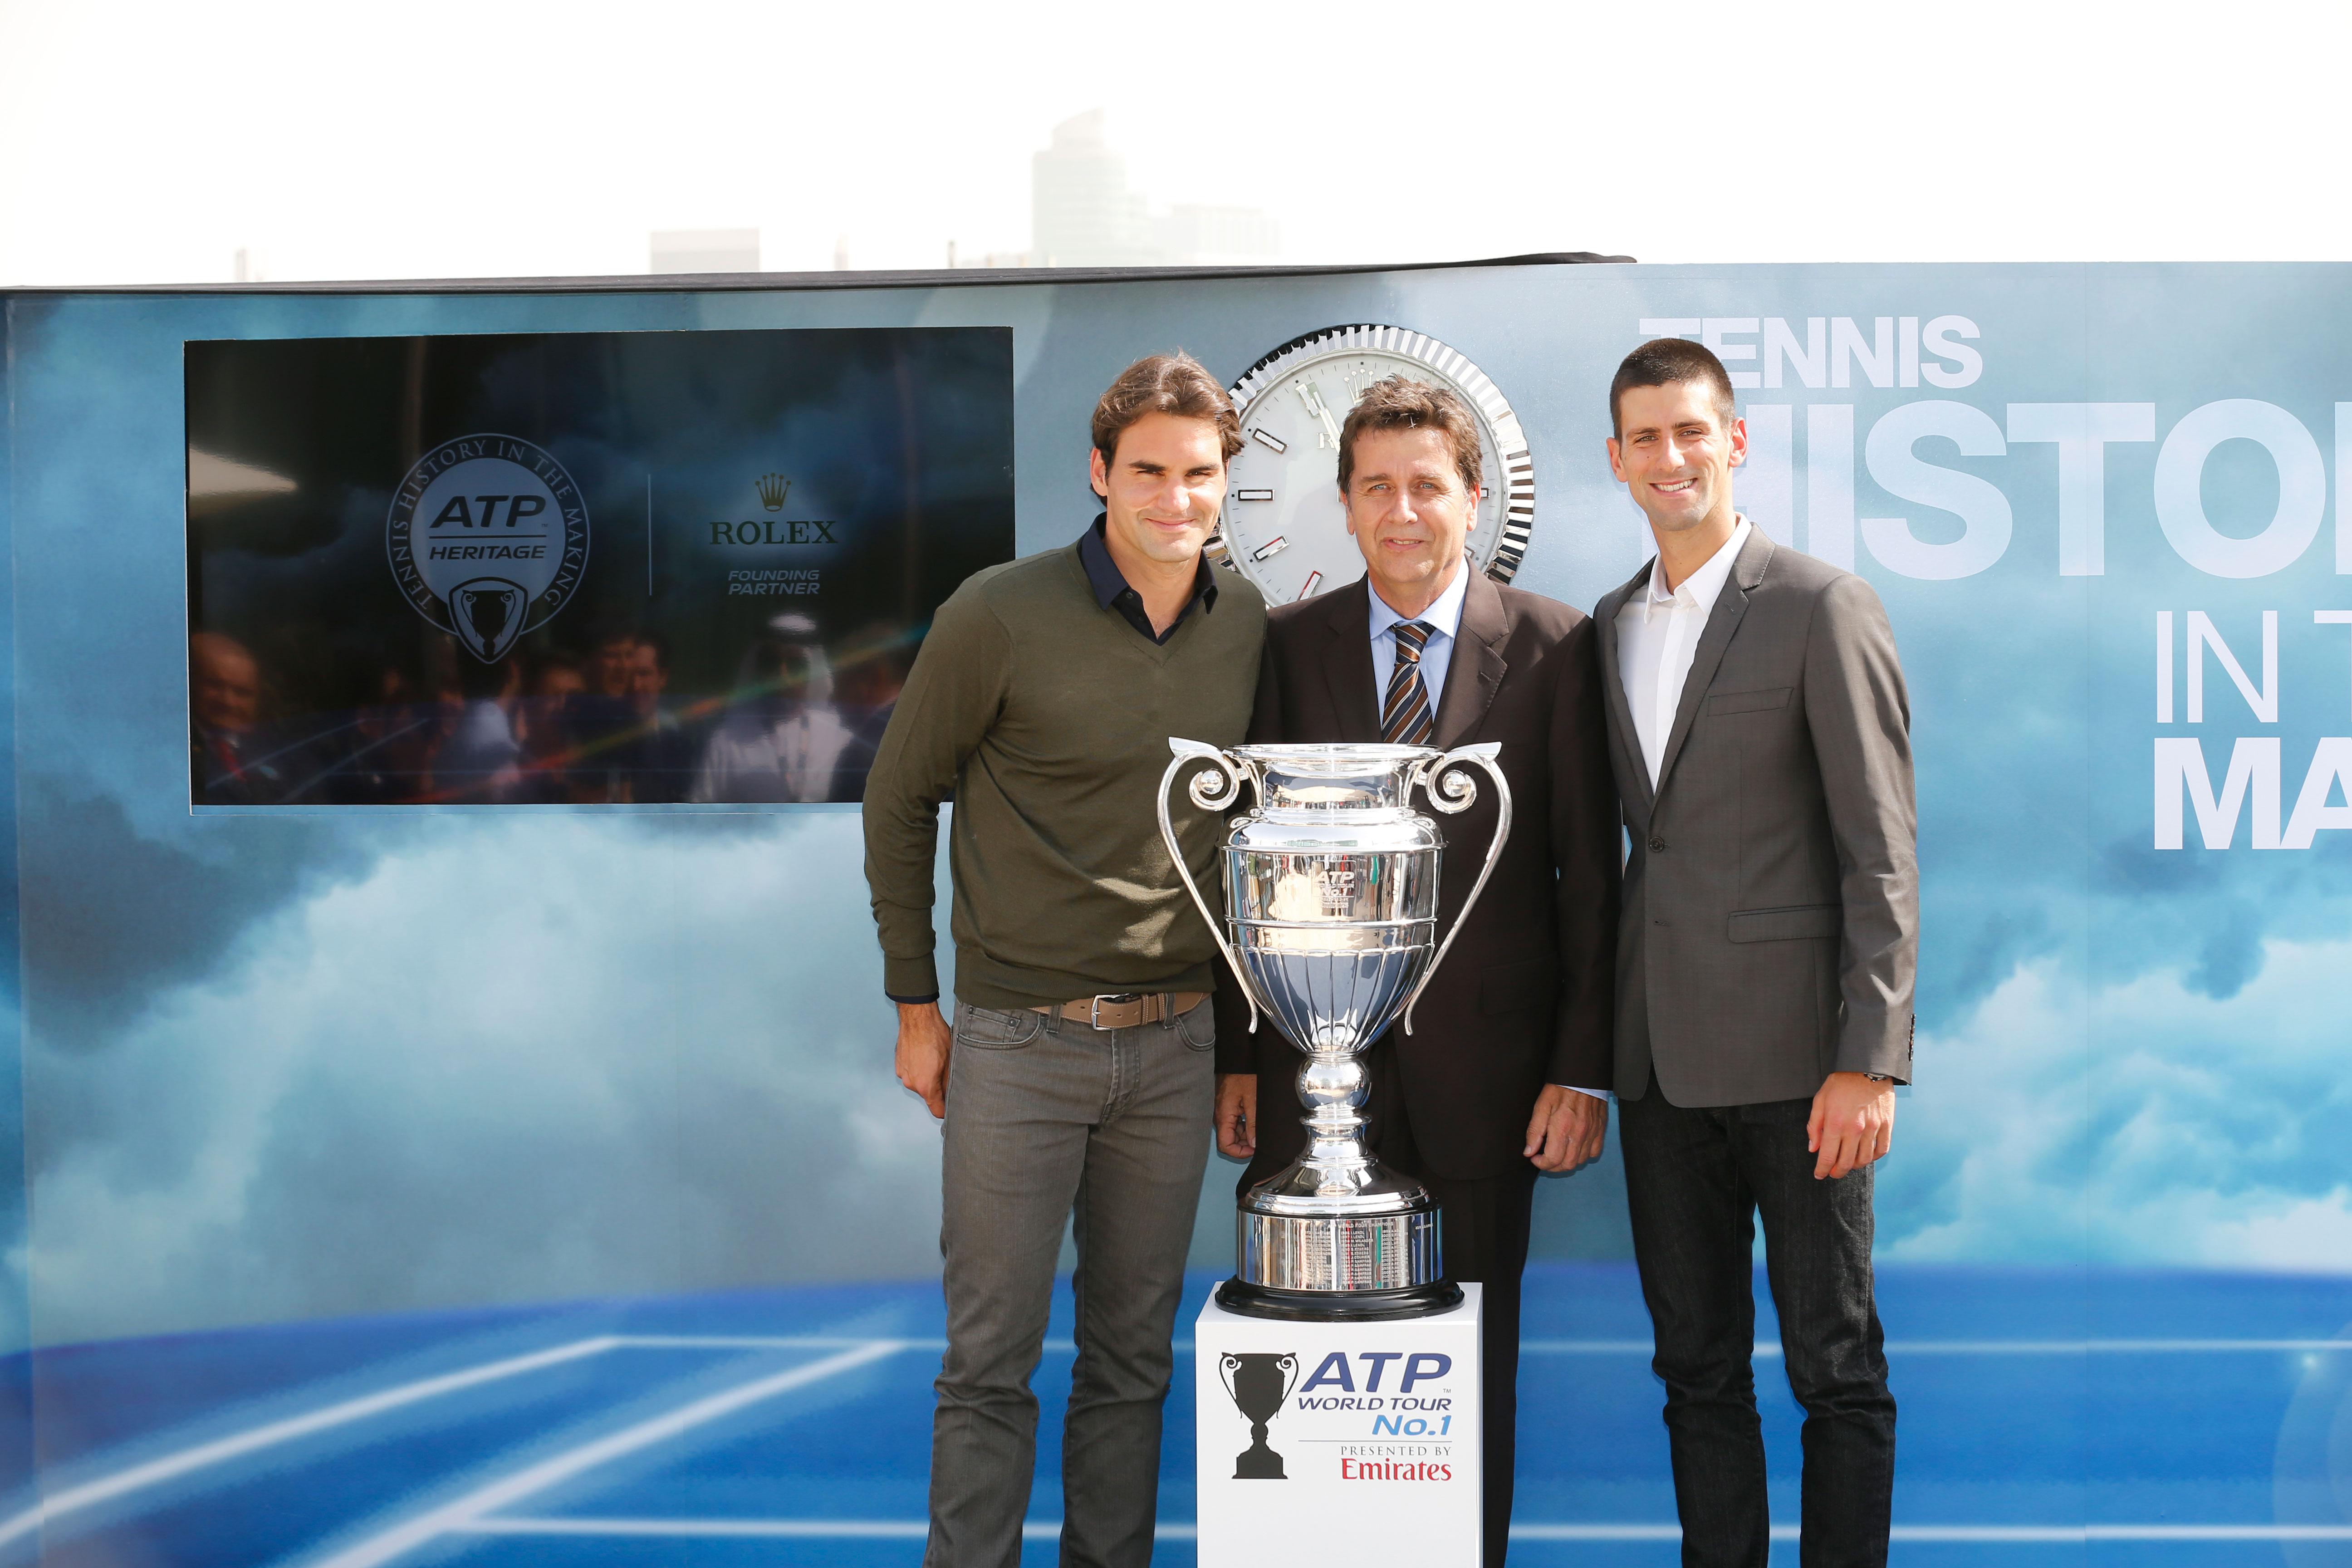 ATP-Heritage-Federer-Drewett-Djokovic